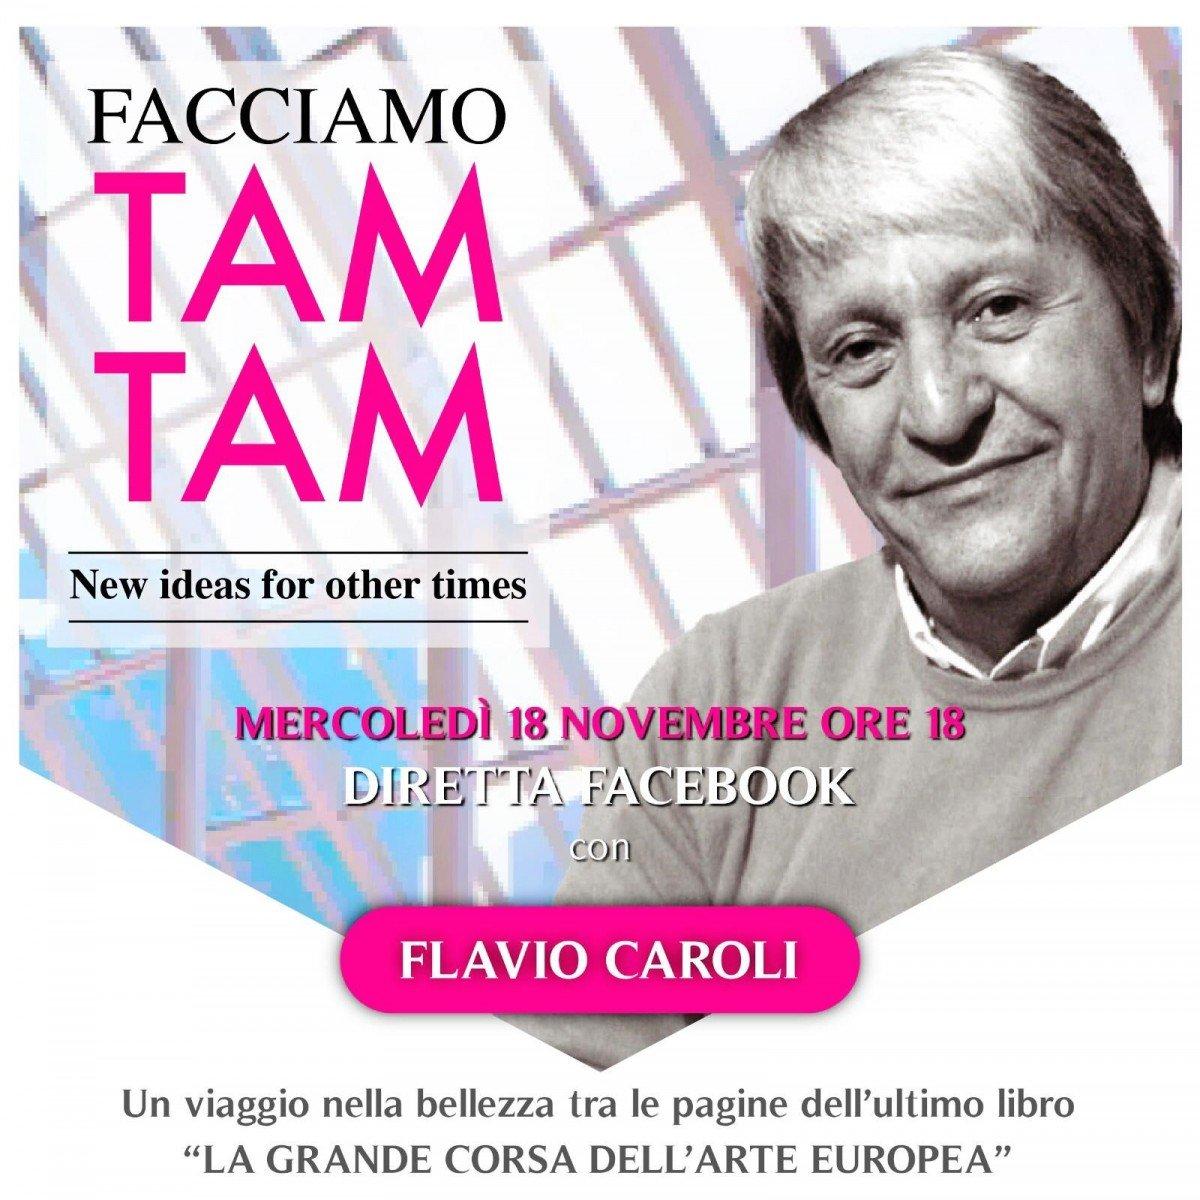 Il Teatro degli Arcimboldi inaugura #FACCIAMOTAMTAM